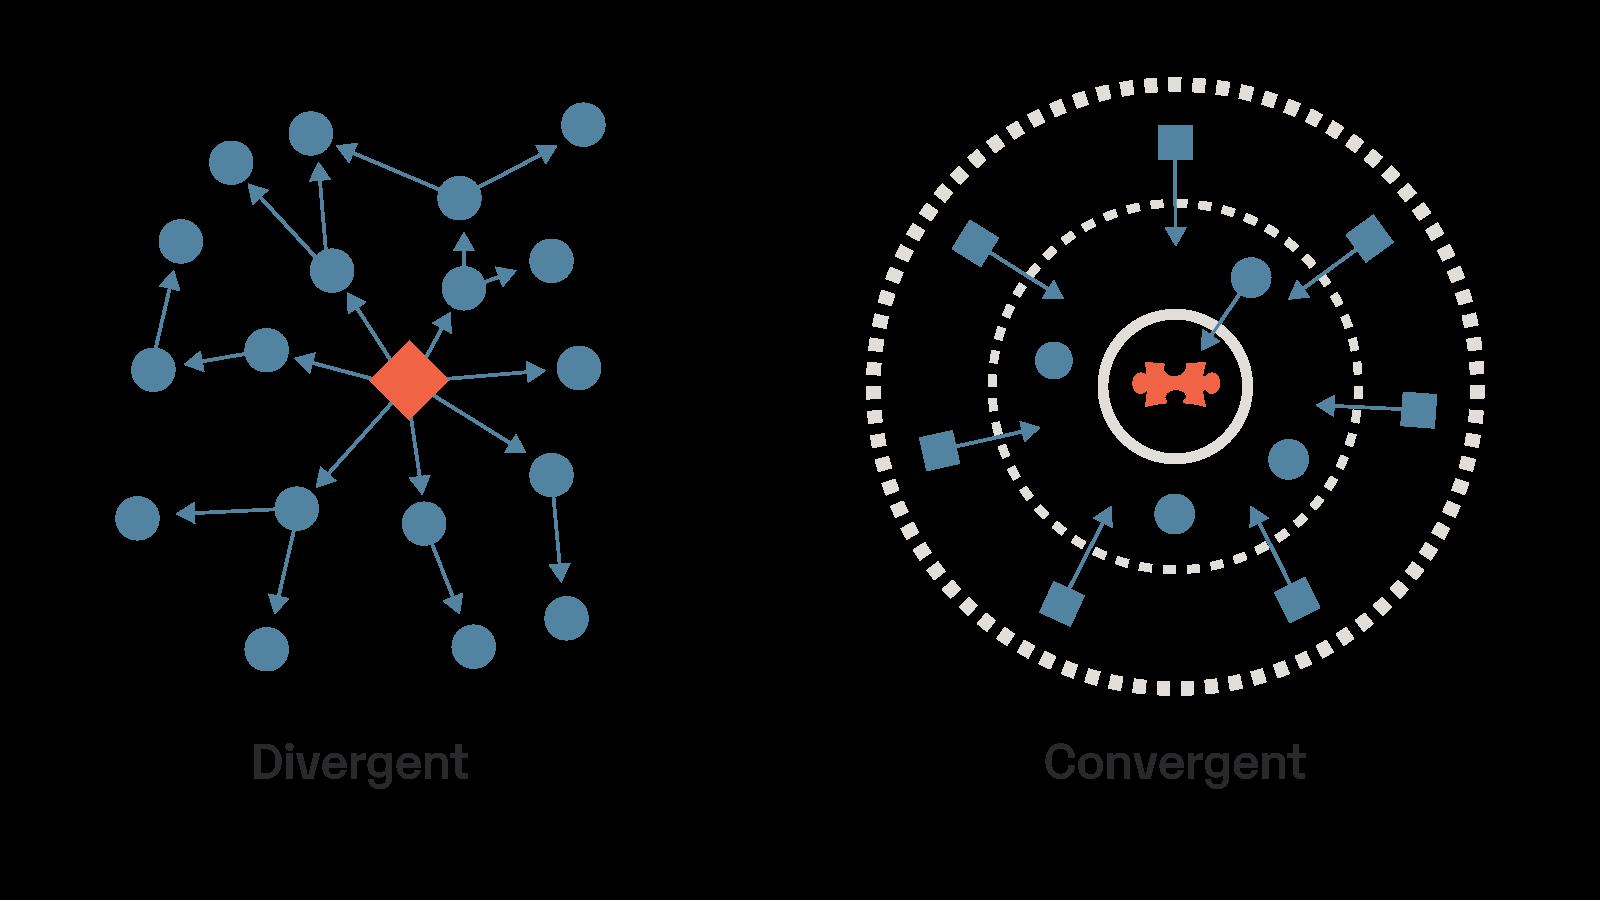 convergent-divergent-thought